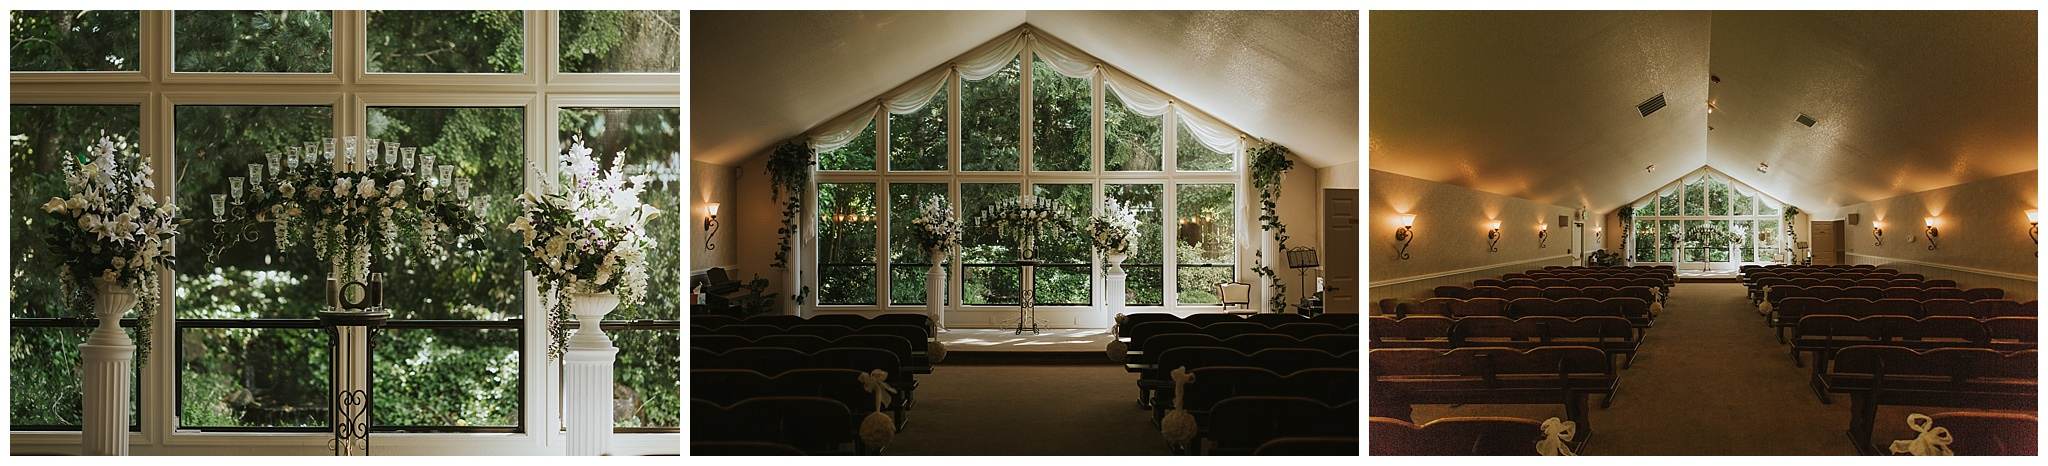 wedding chapel in hostess house